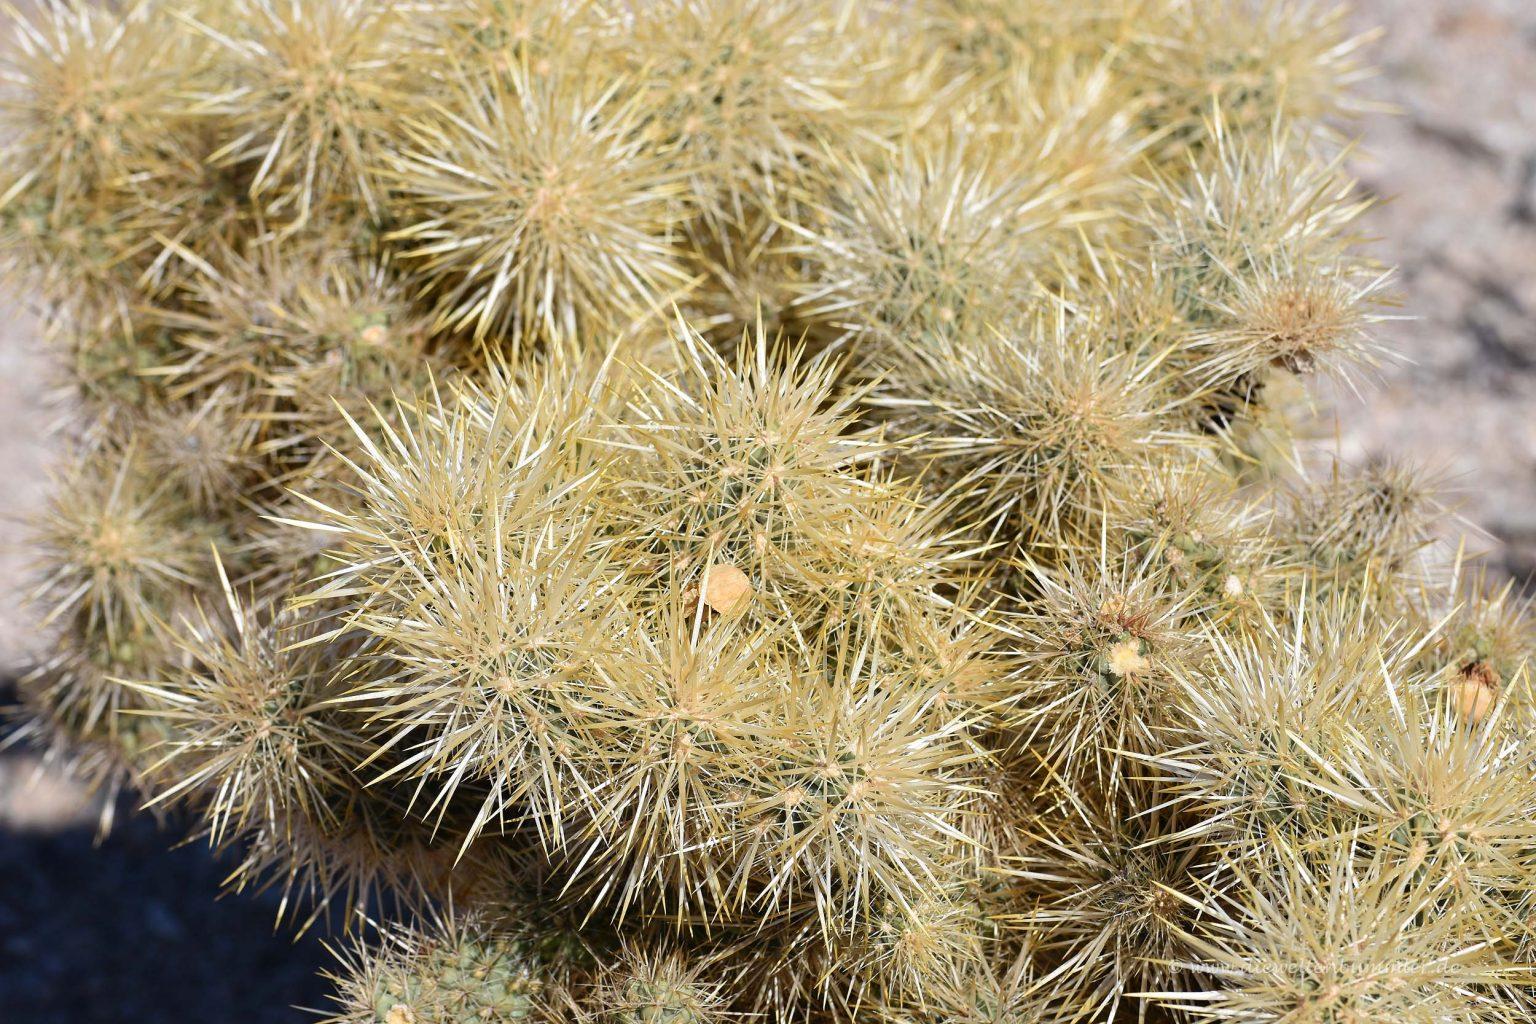 Kaktus in der Mojave-Wüste